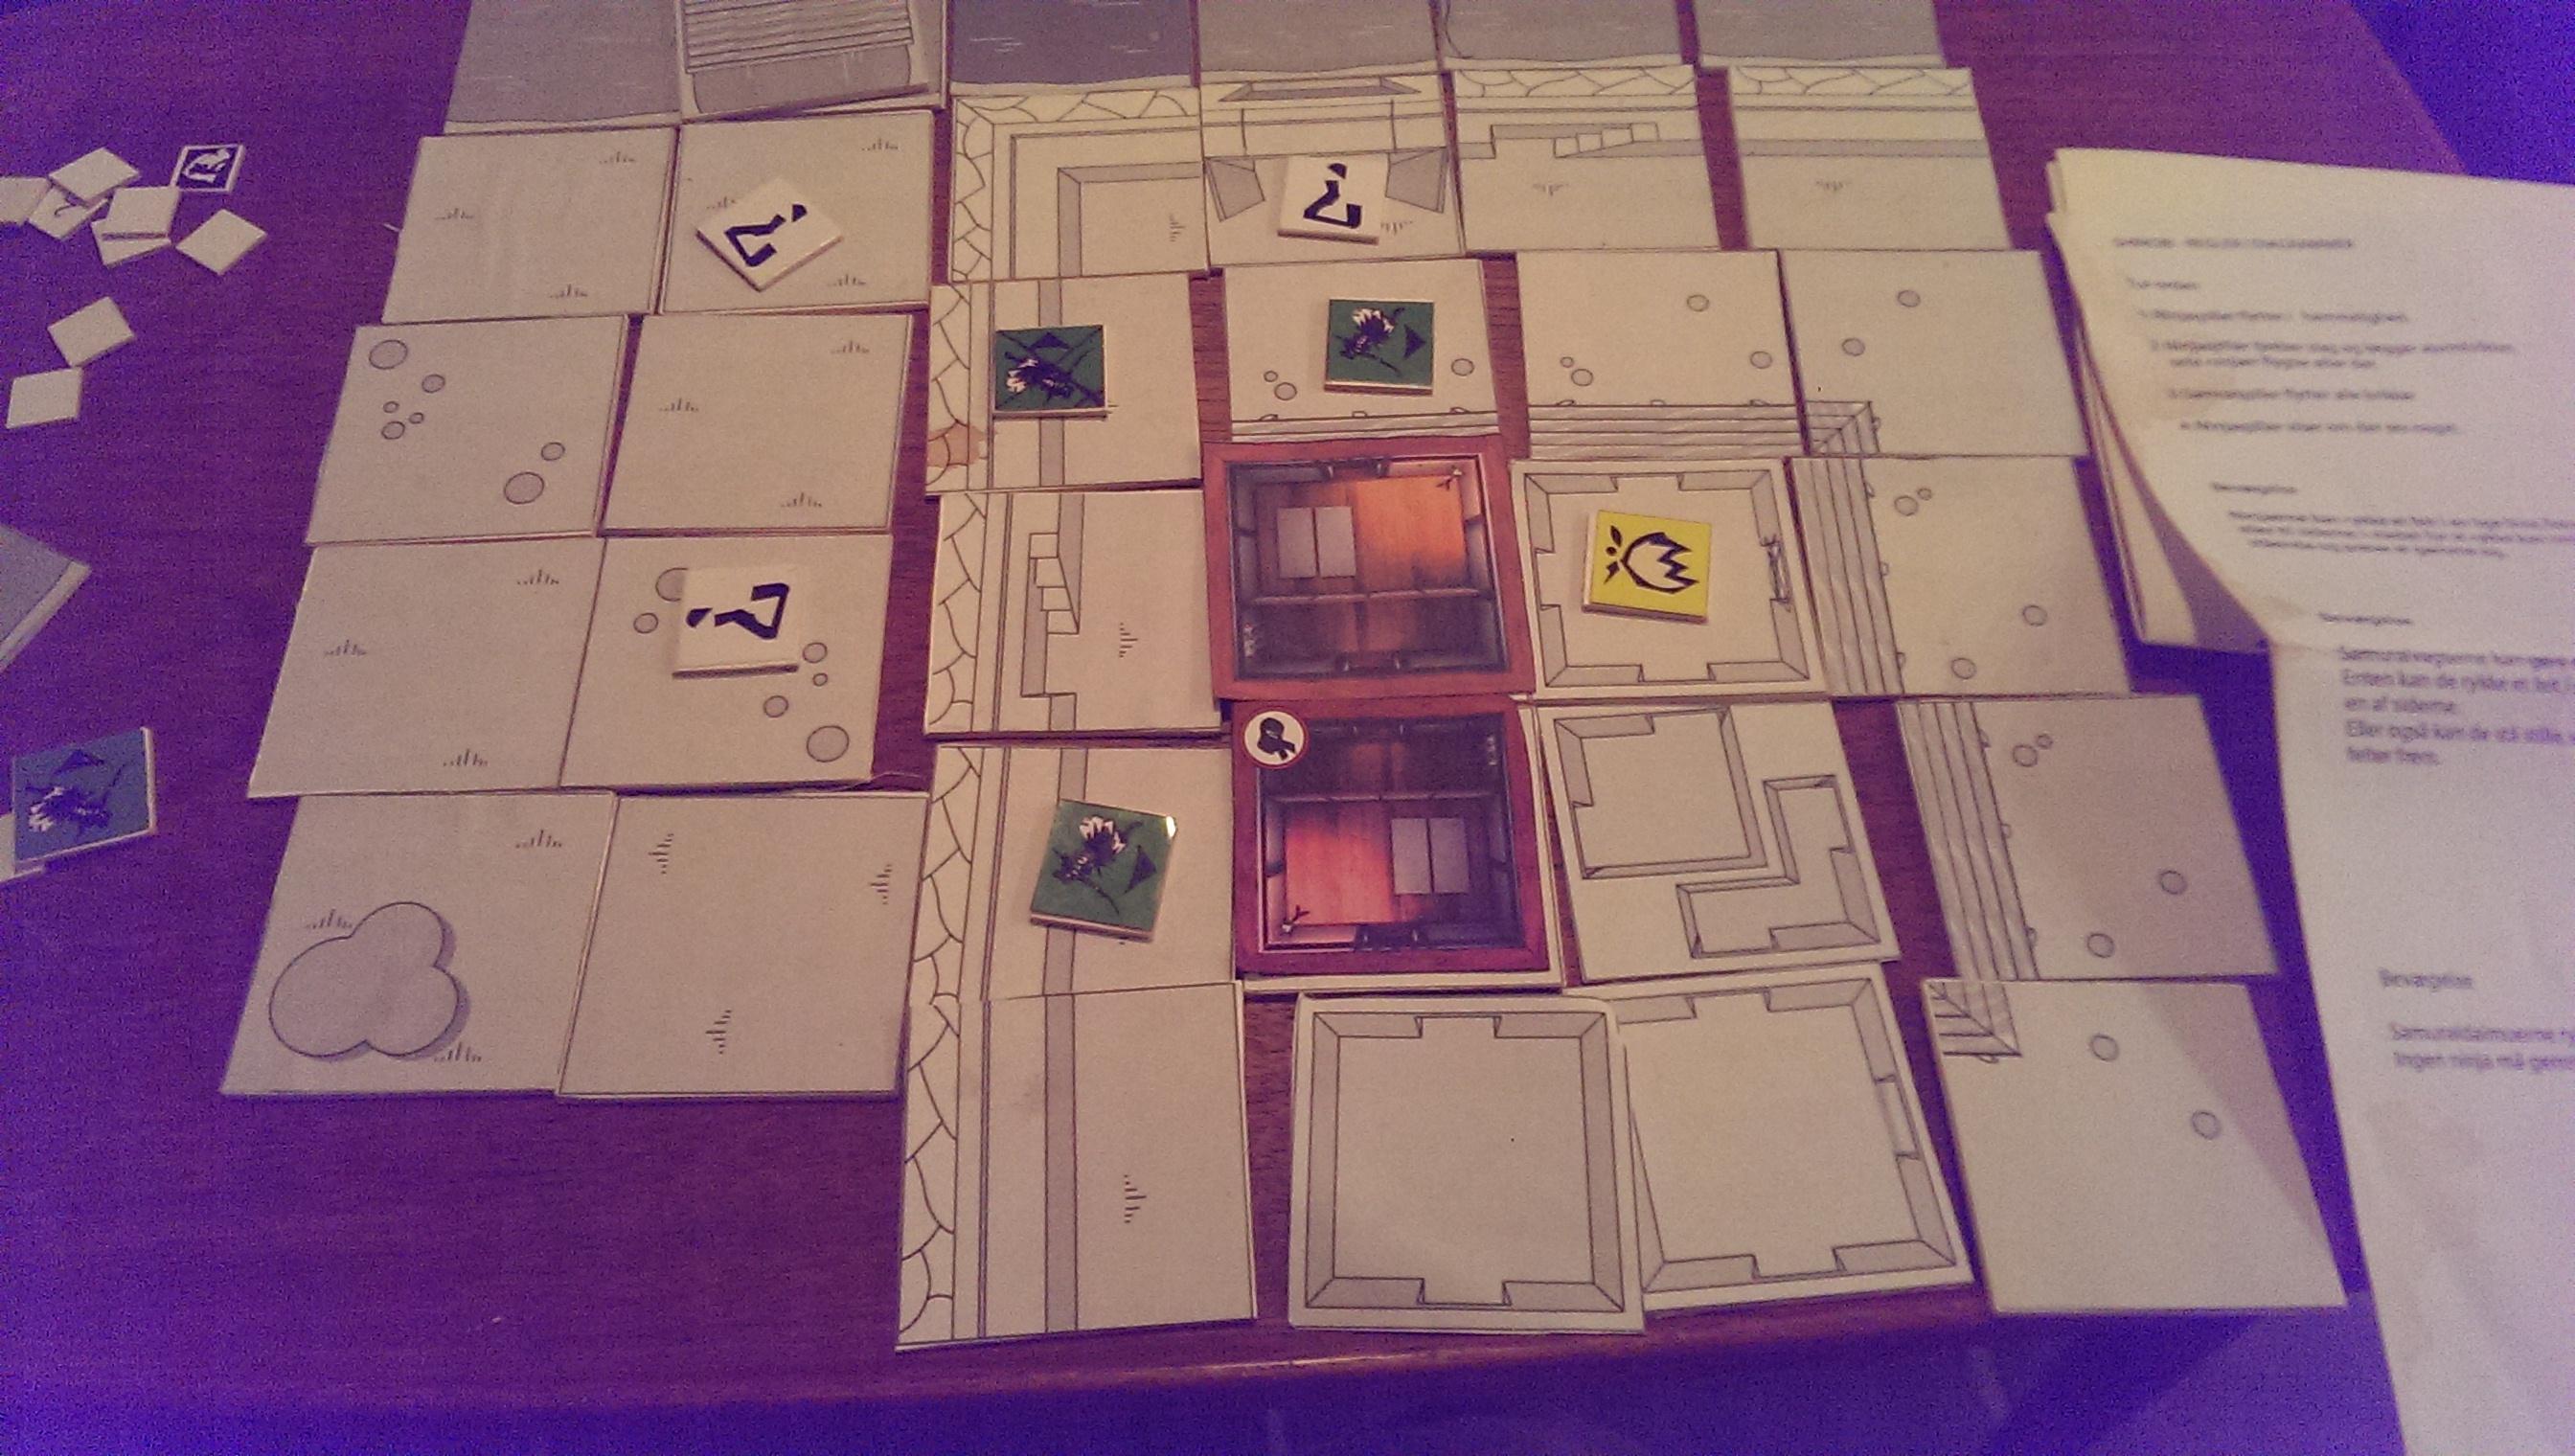 GHG's Ninja game